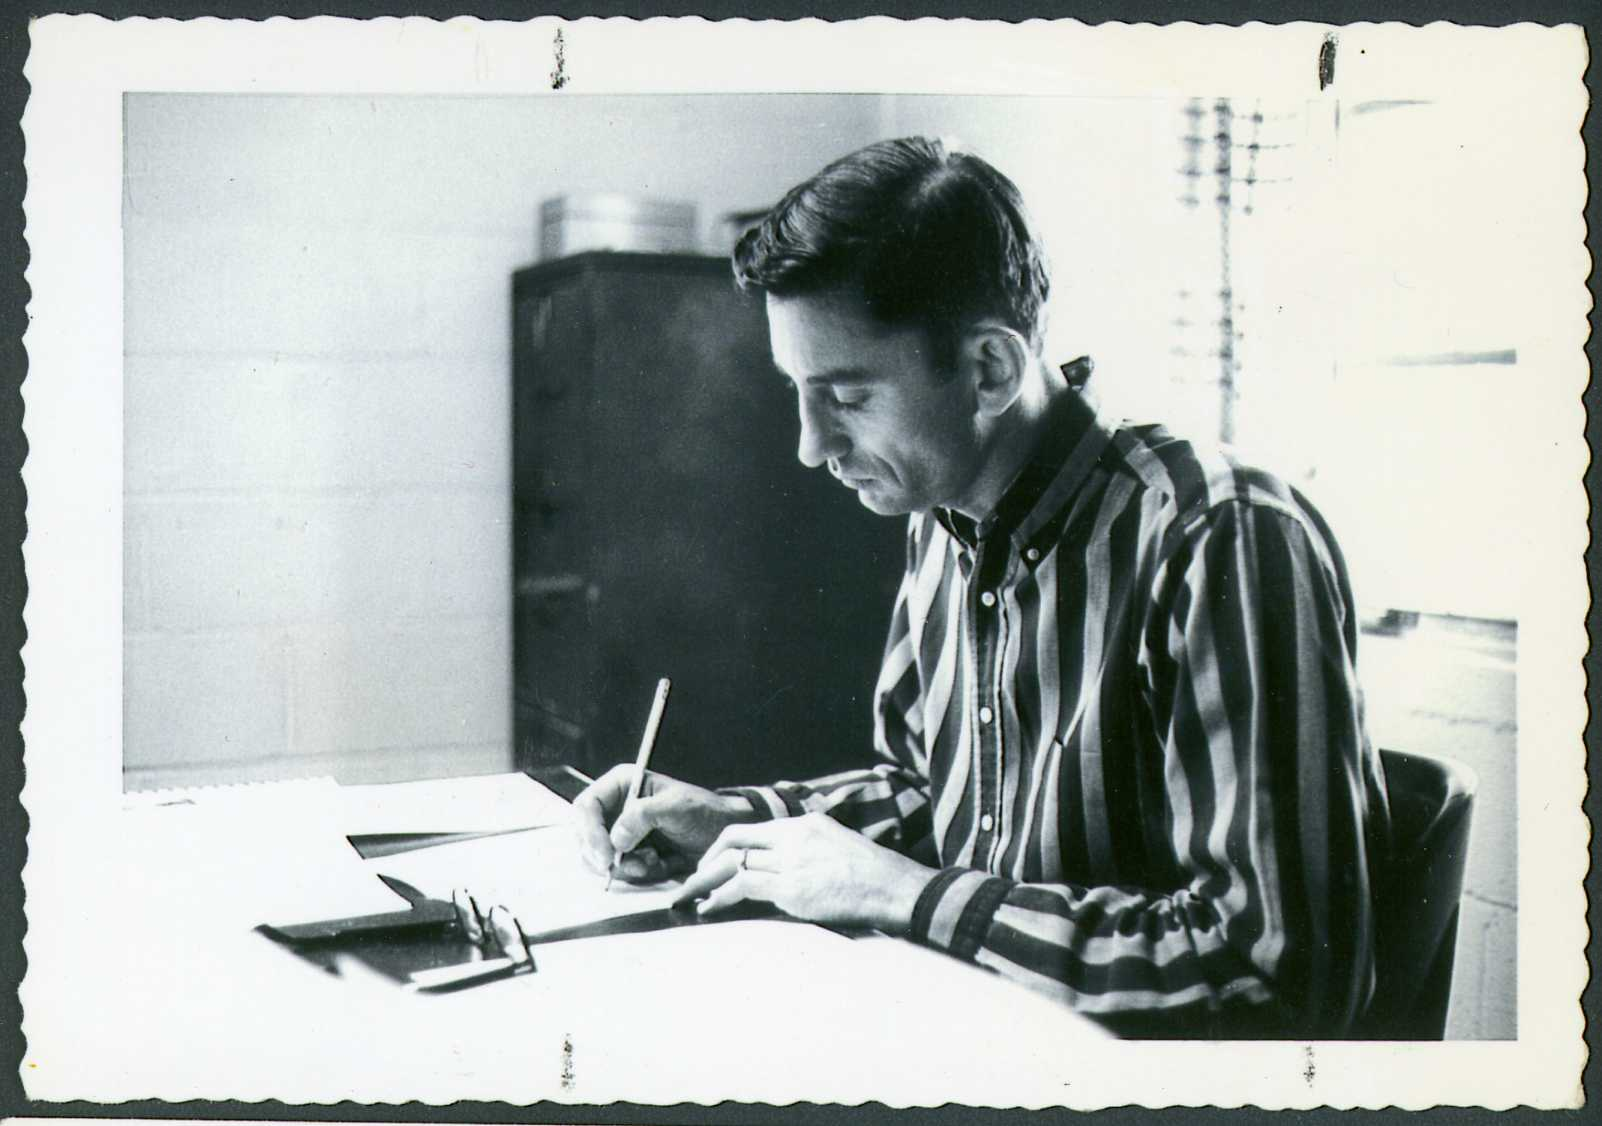 Millard Fuller at Koinonia in the 1970s